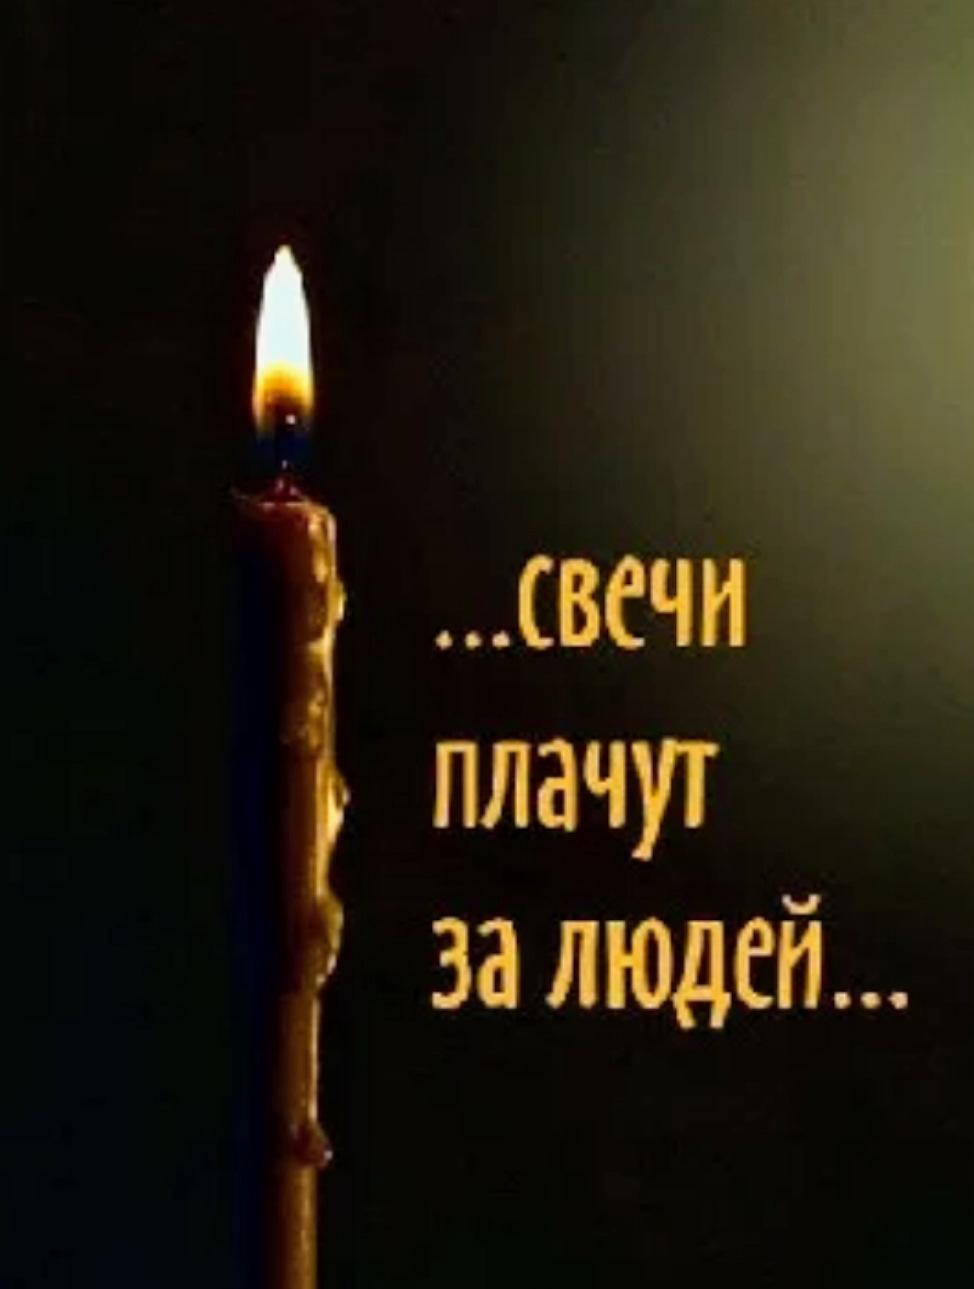 Дракула картинка, открытка свечи плачут за людей